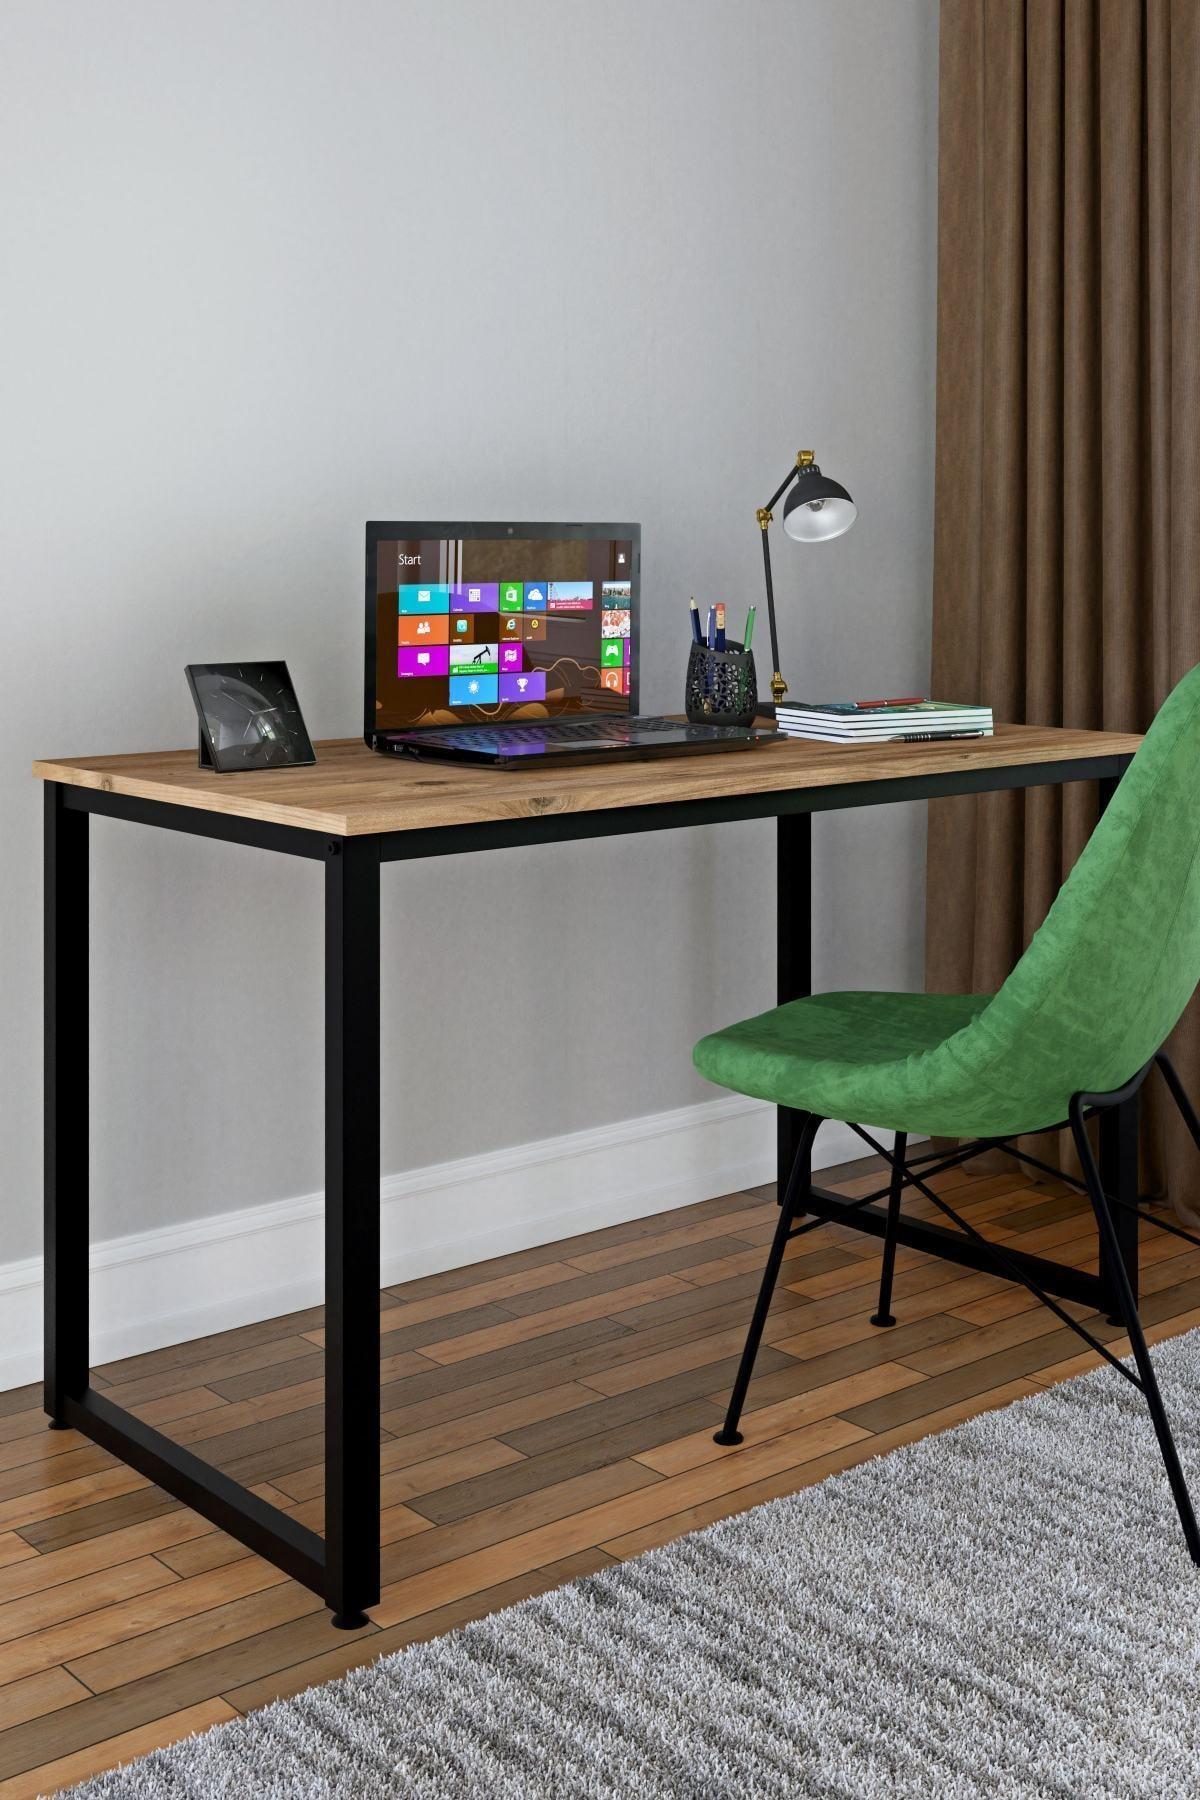 60 X 120 Cm Çalışma Masası Bilgisayar Masası Ofis Masası - Atlantik Çam